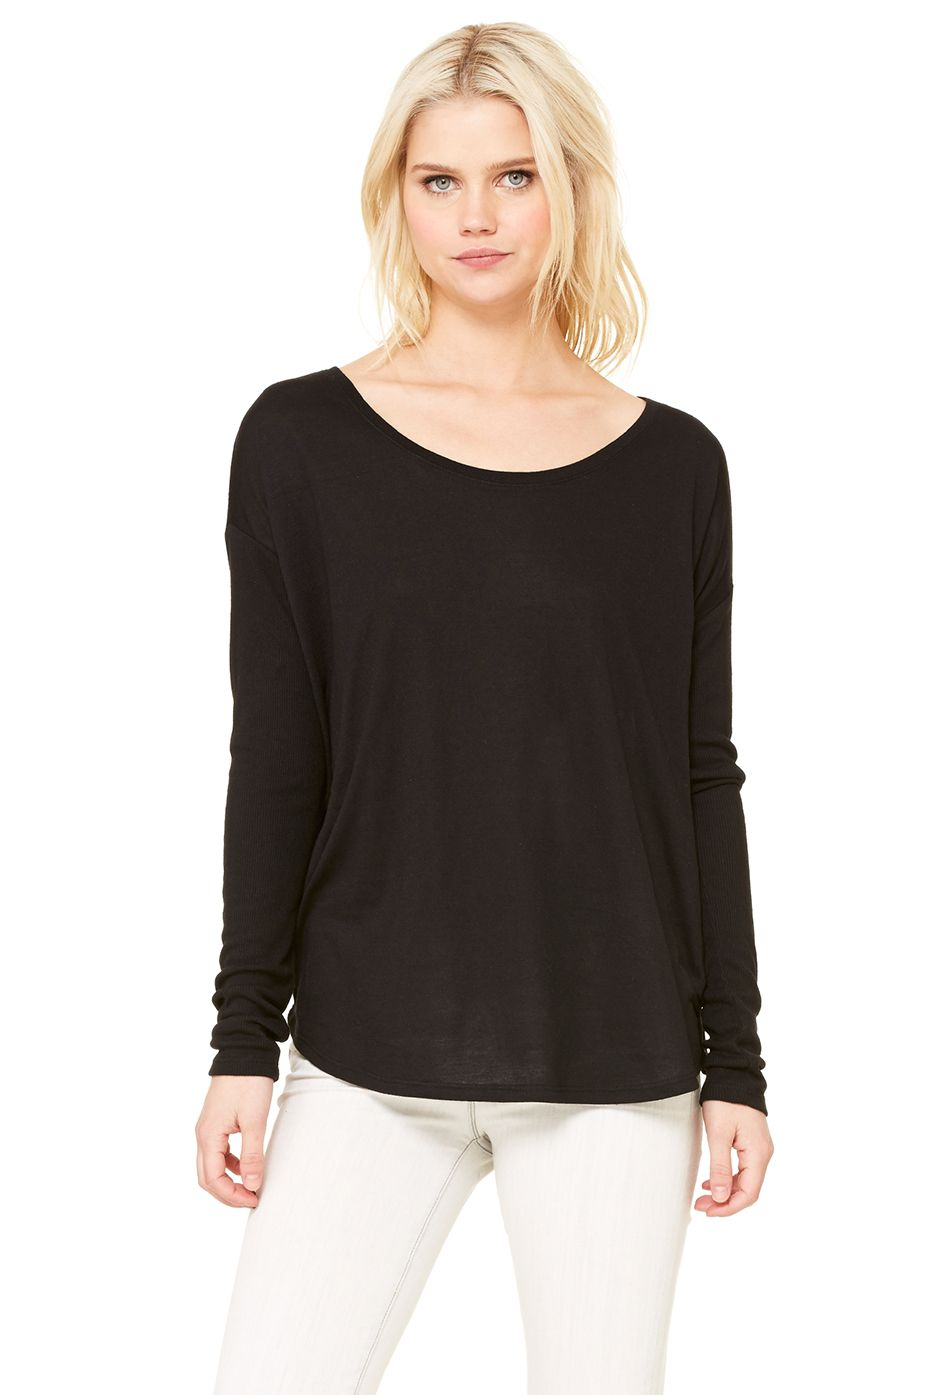 ef66a581 bella canvas women's flowy long sleeve tee w/ 2x1 sleeves   So Hot ...